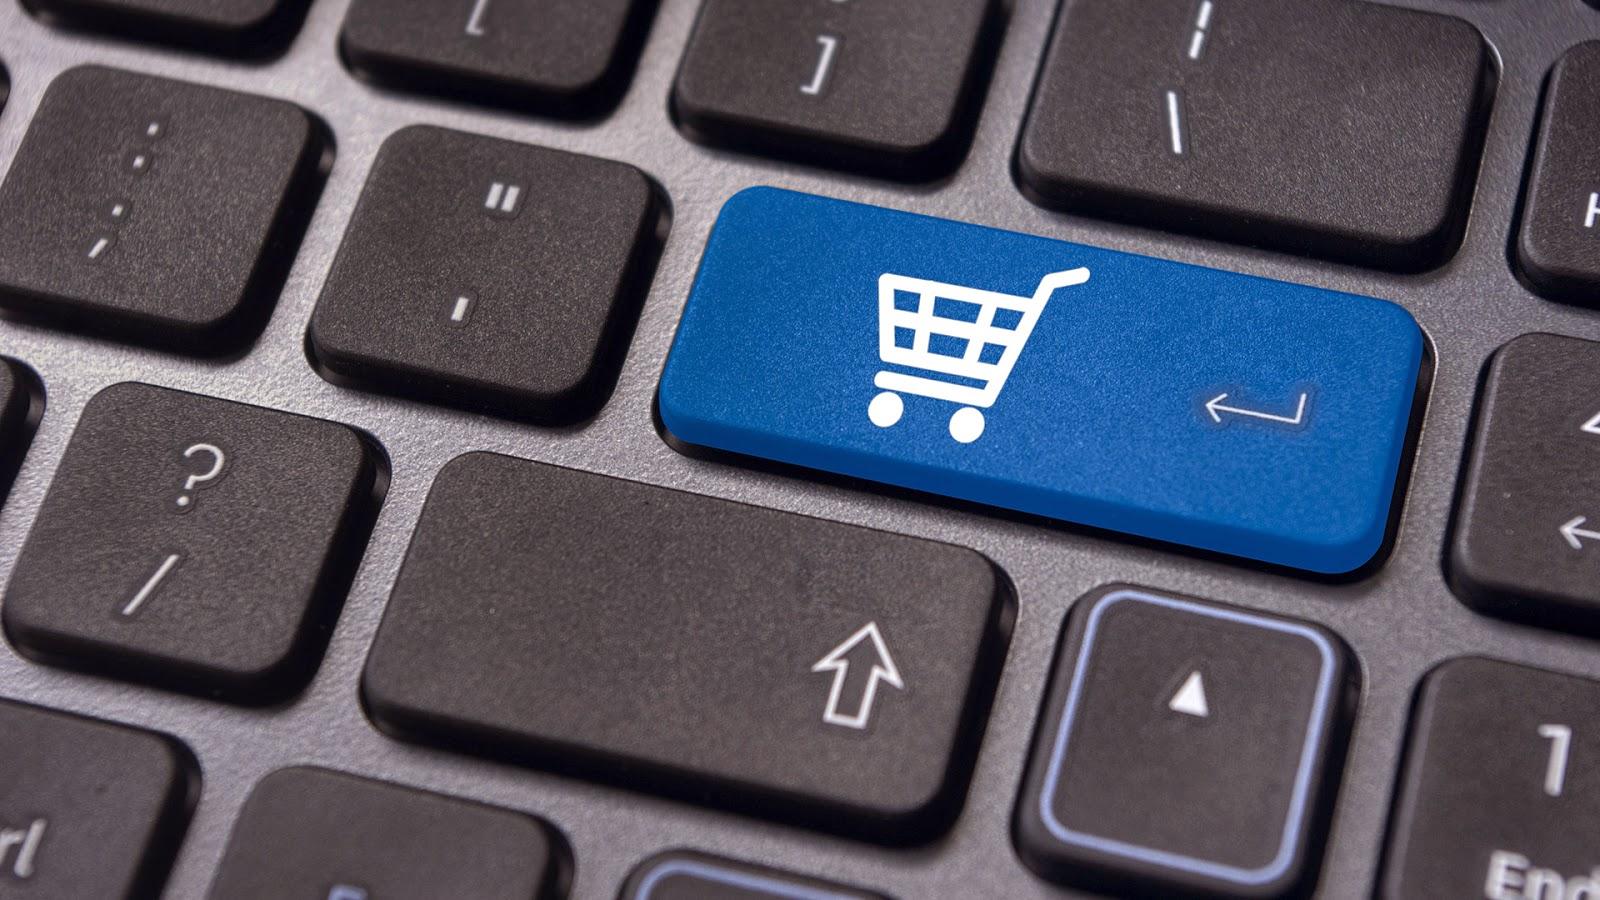 Online Marketplace Indonesia | Marketplace Indonesia | Toko Gadget Online Terpercaya